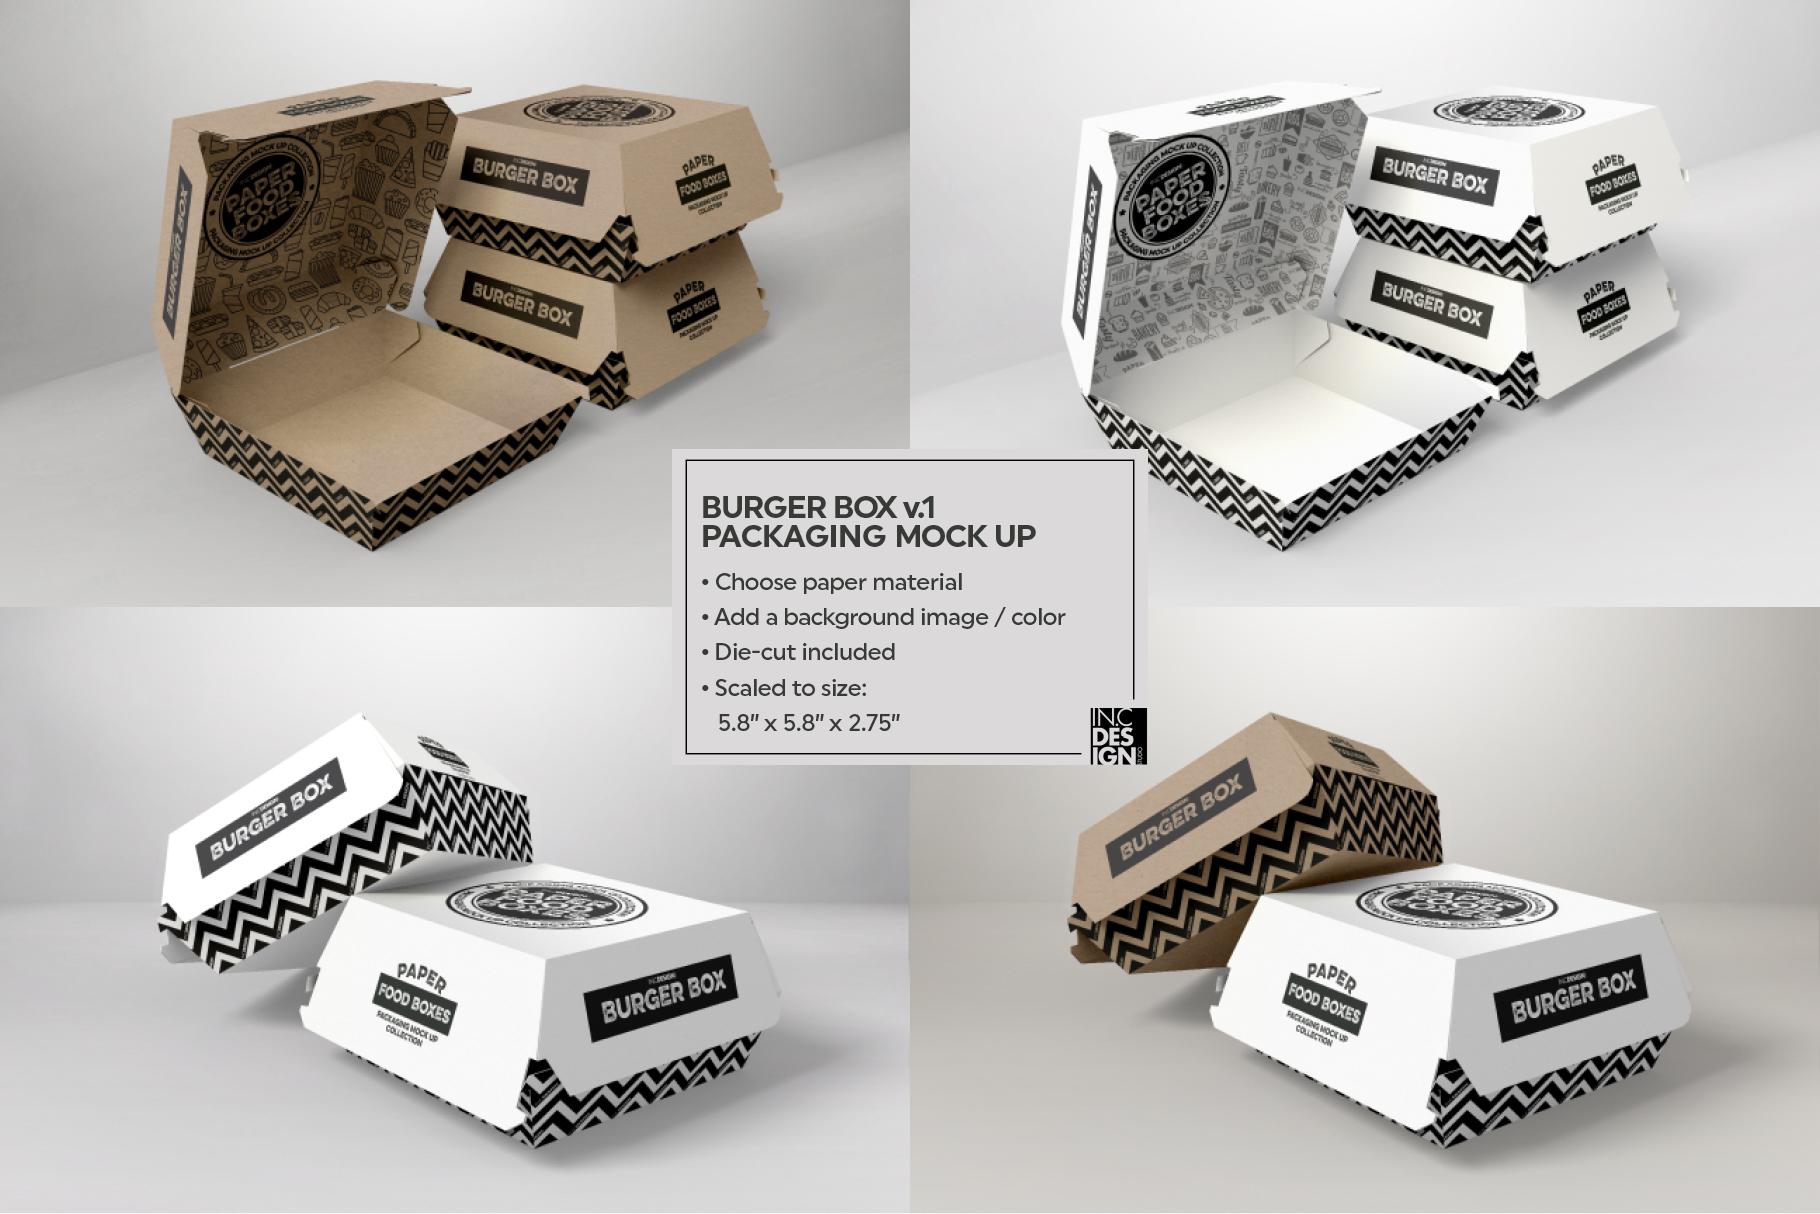 Burger Box Packaging Mock Up v1 example image 2